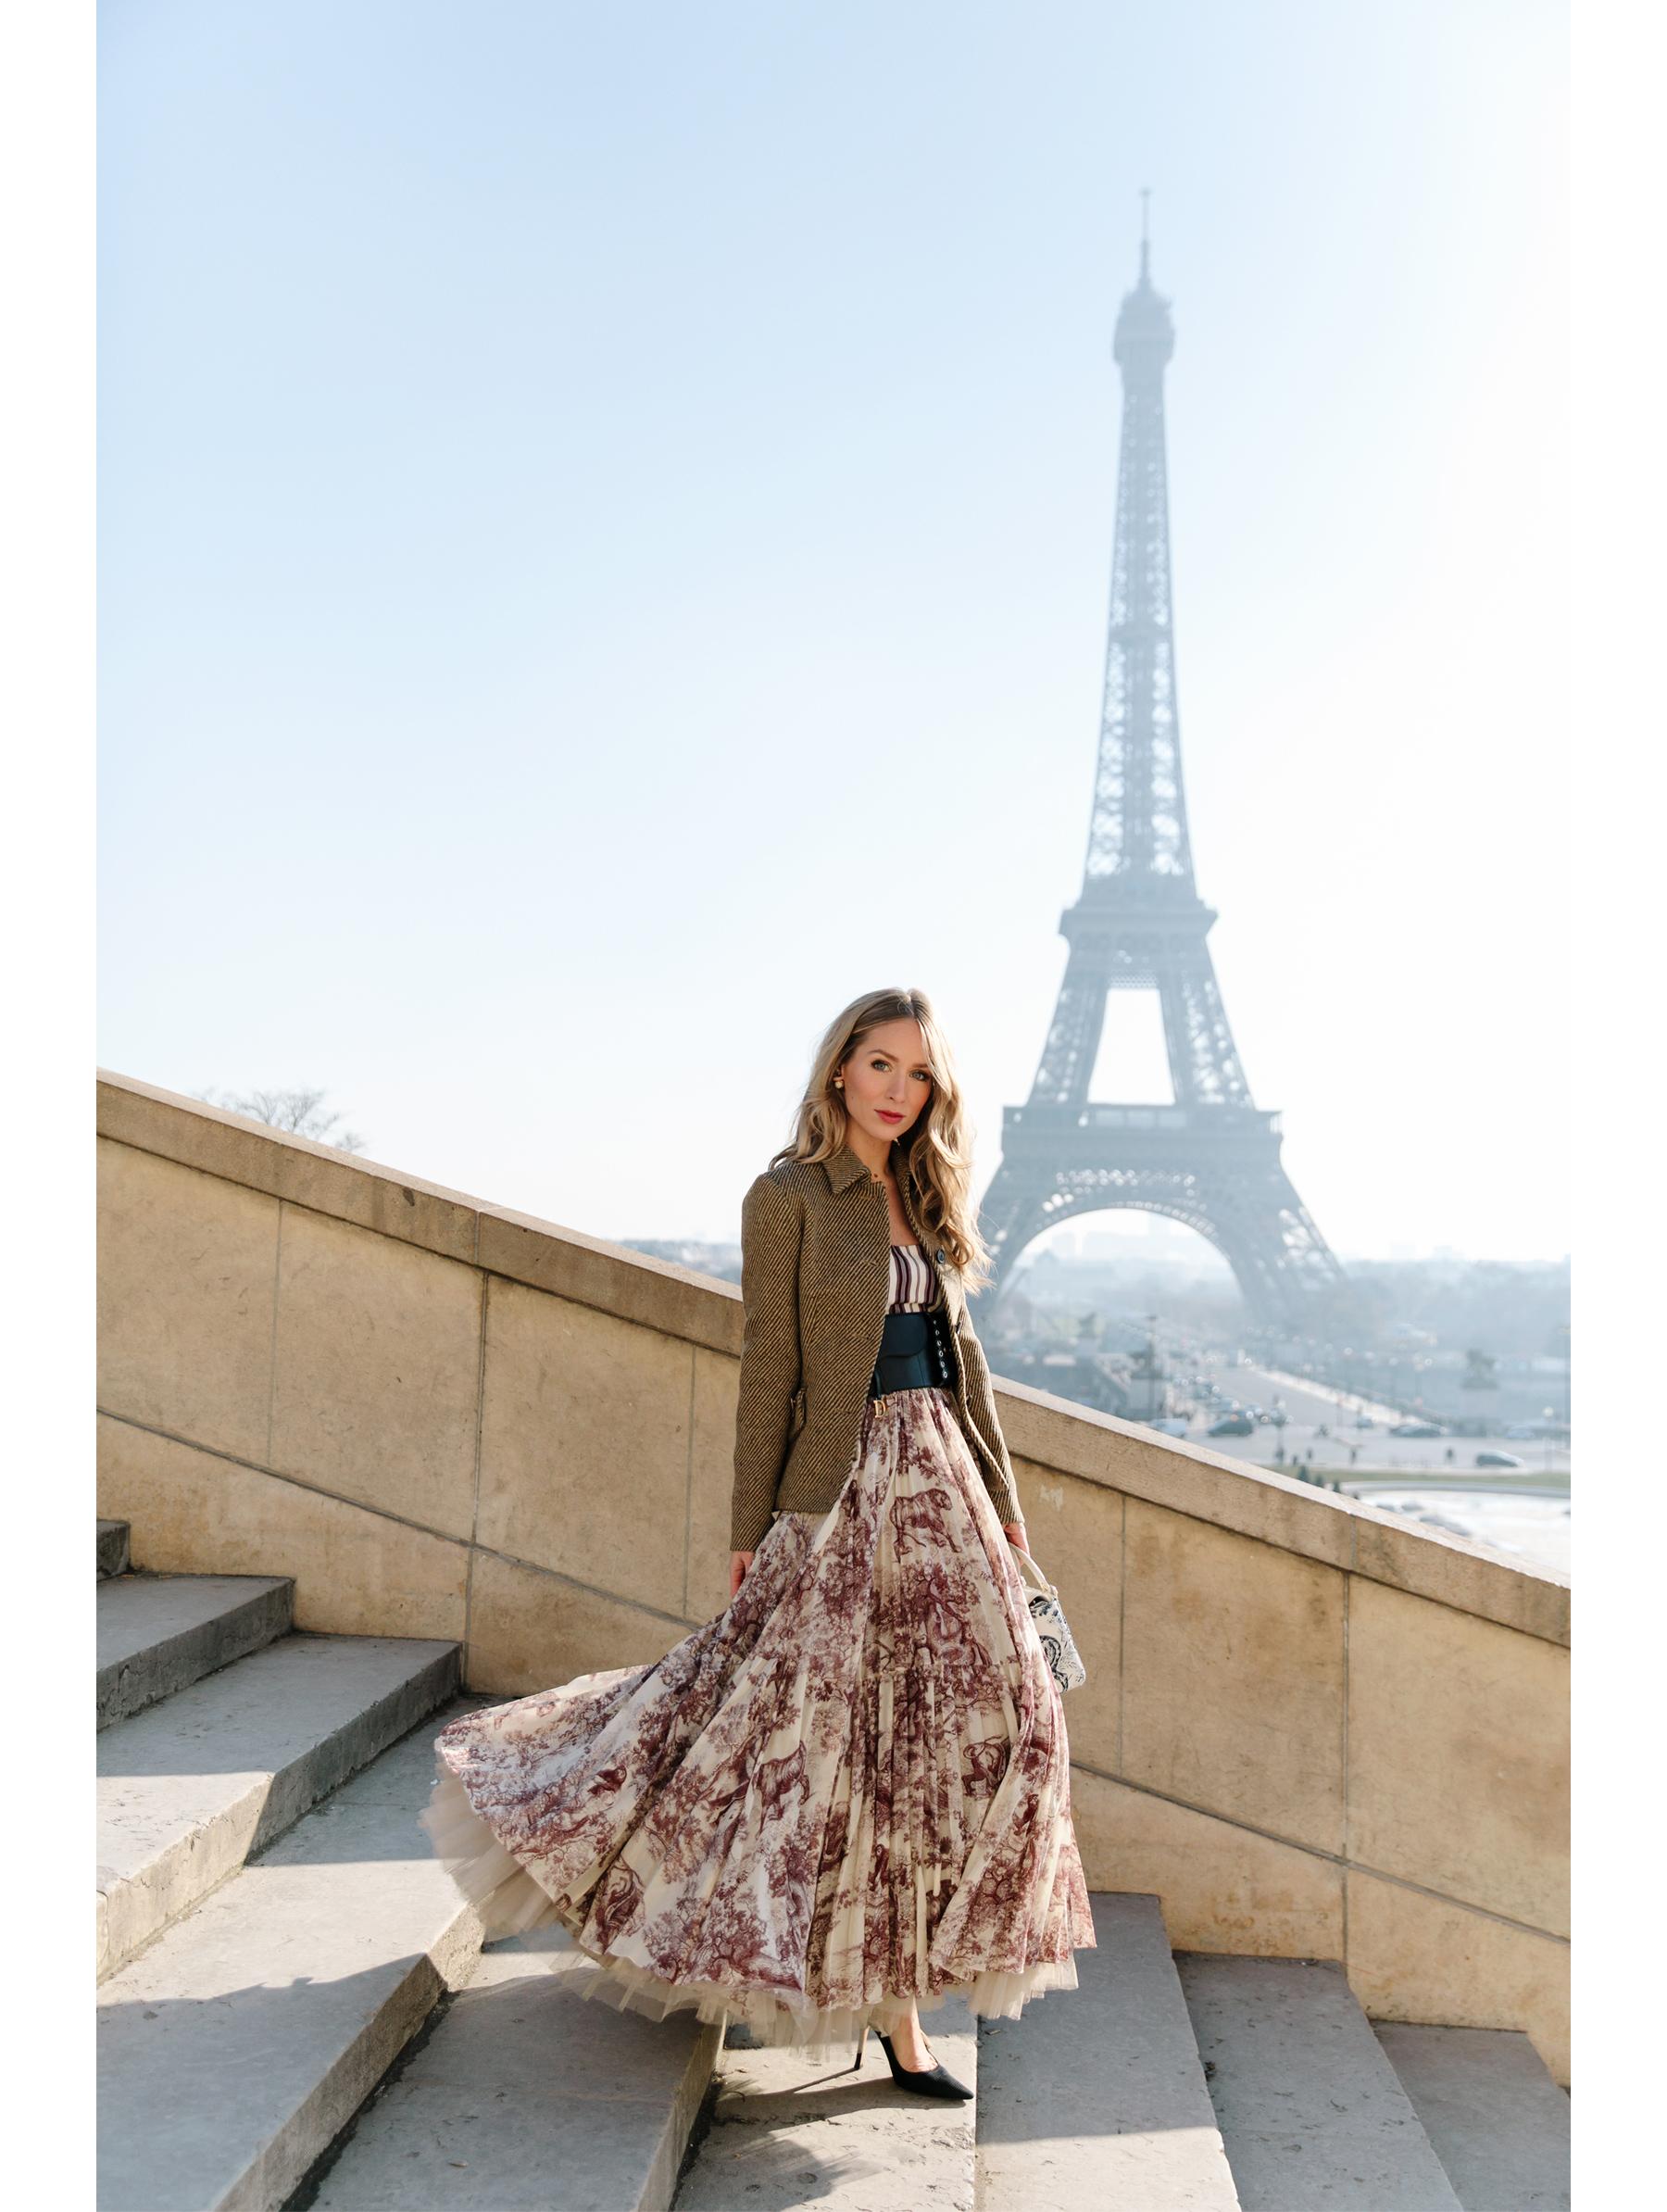 Carin_Olsson_Dior_01.jpg